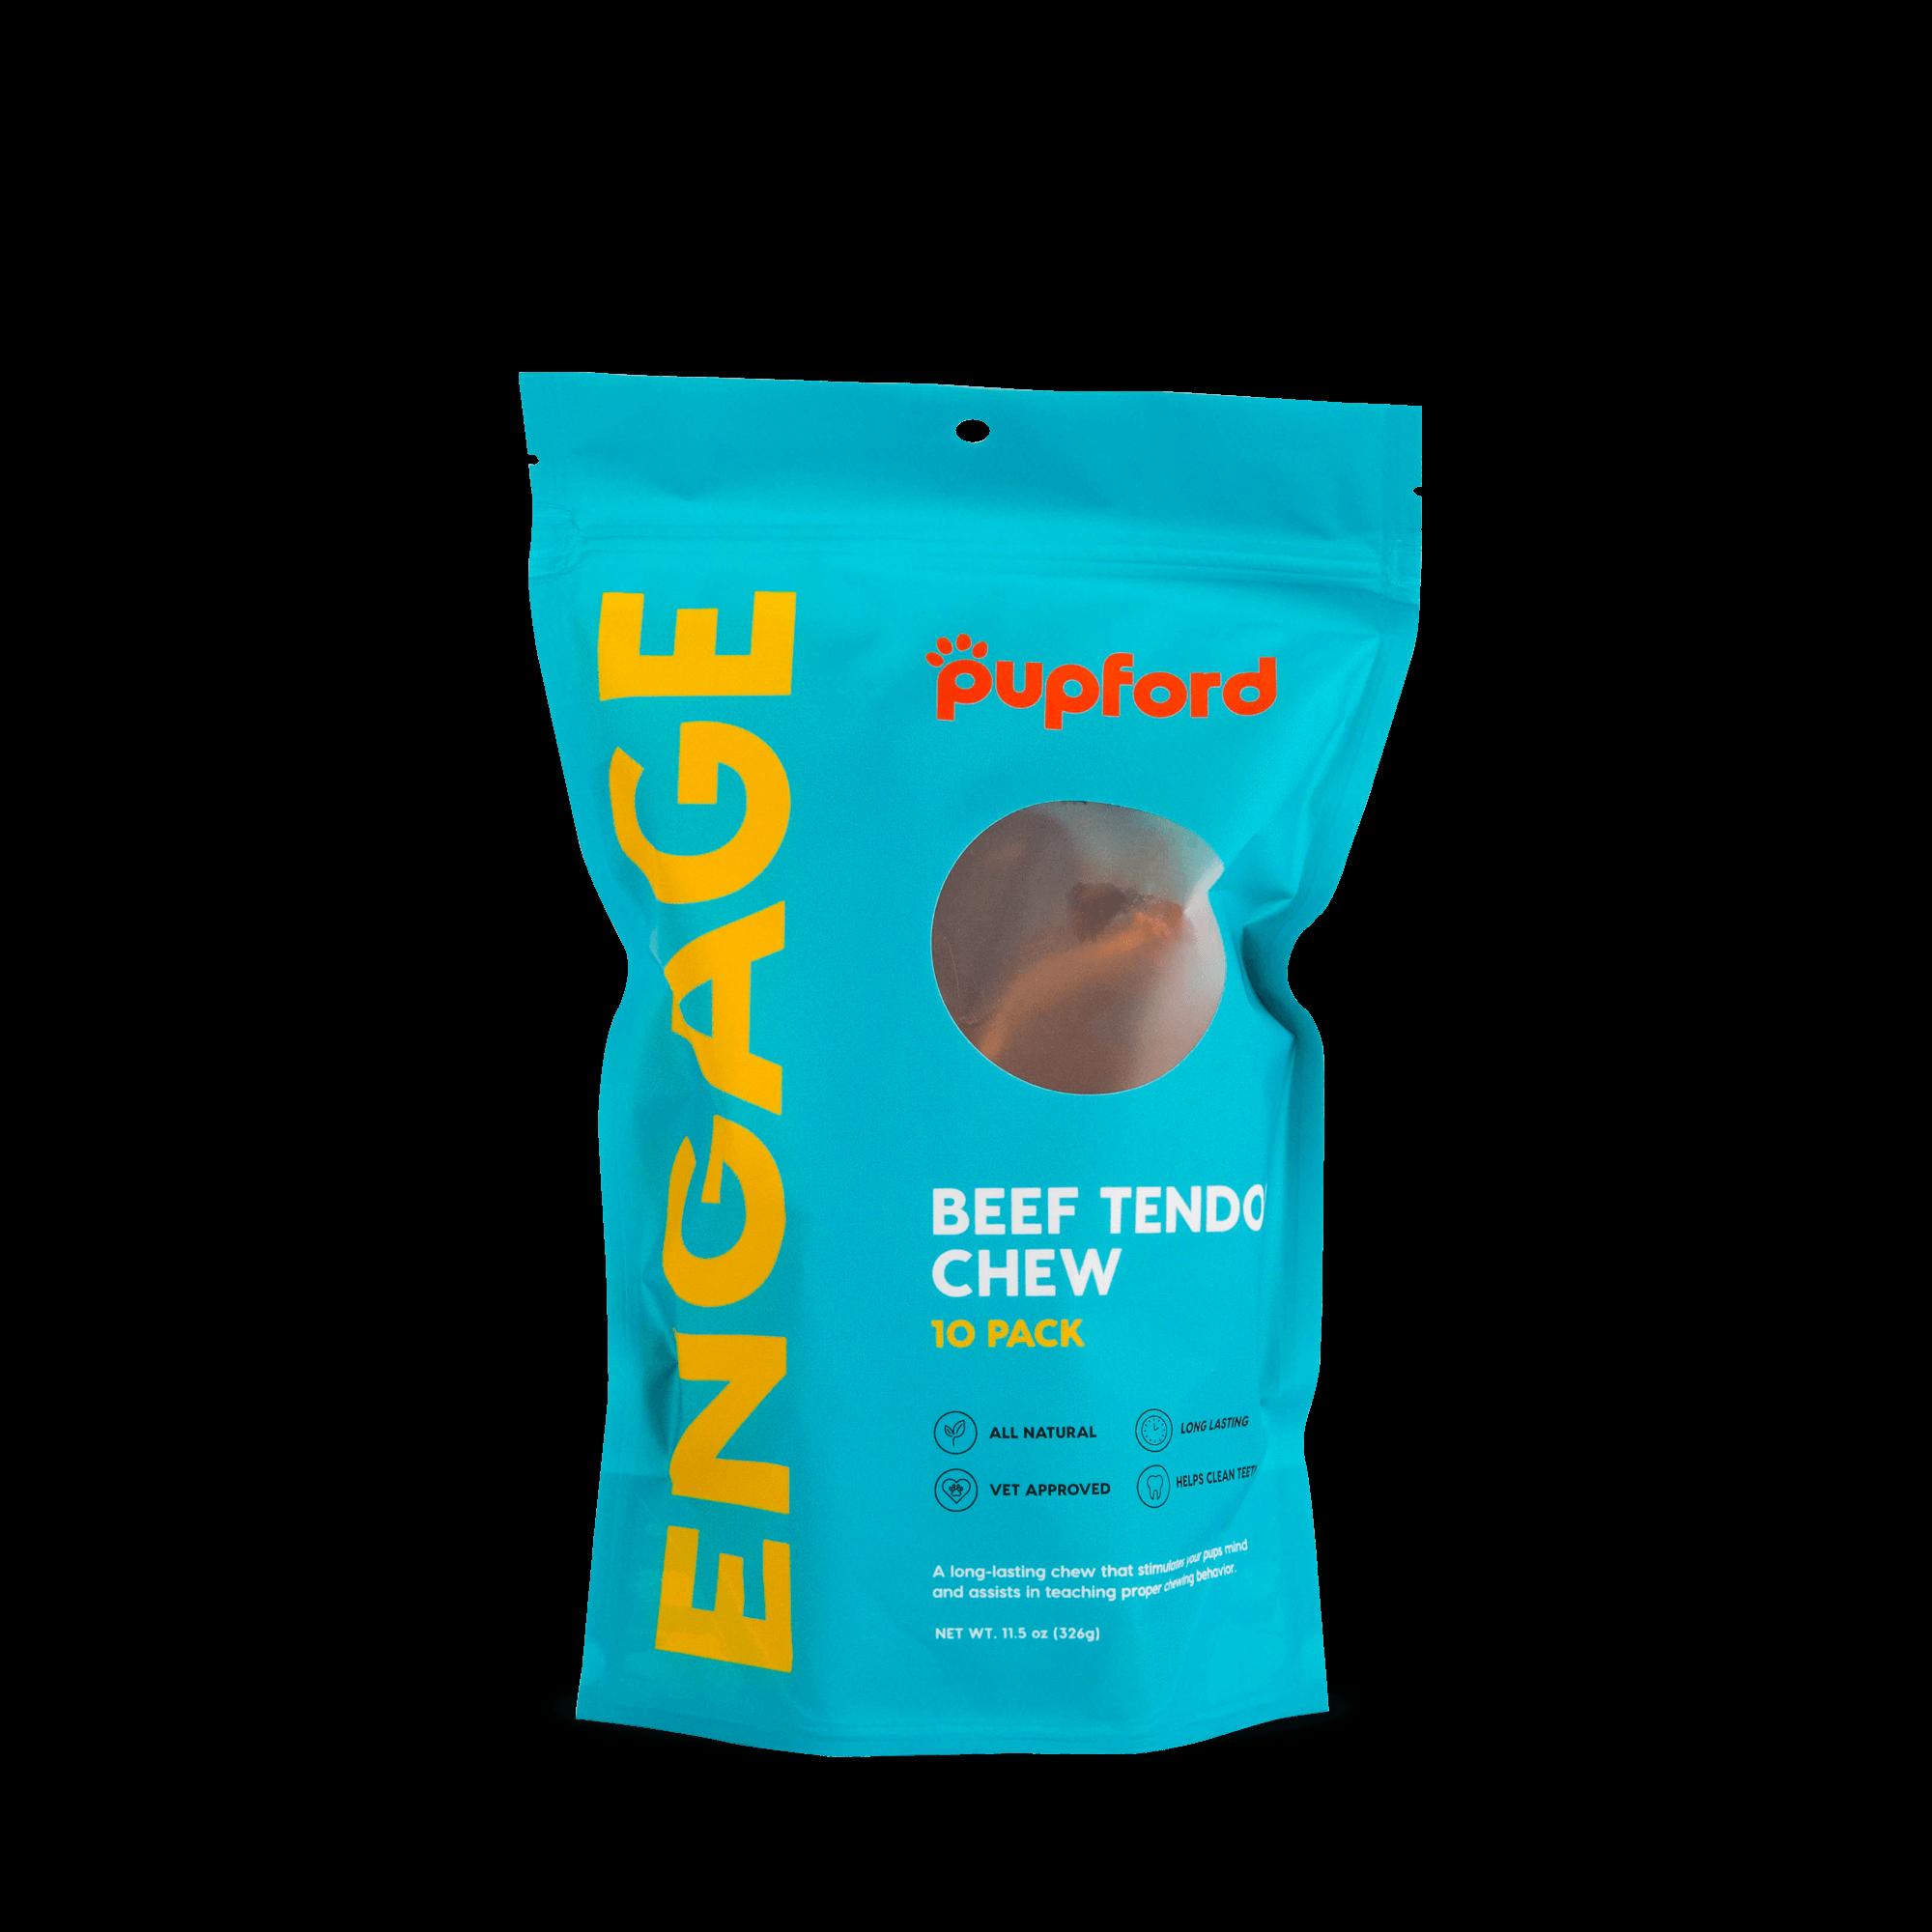 BeefTendon-10pack-front